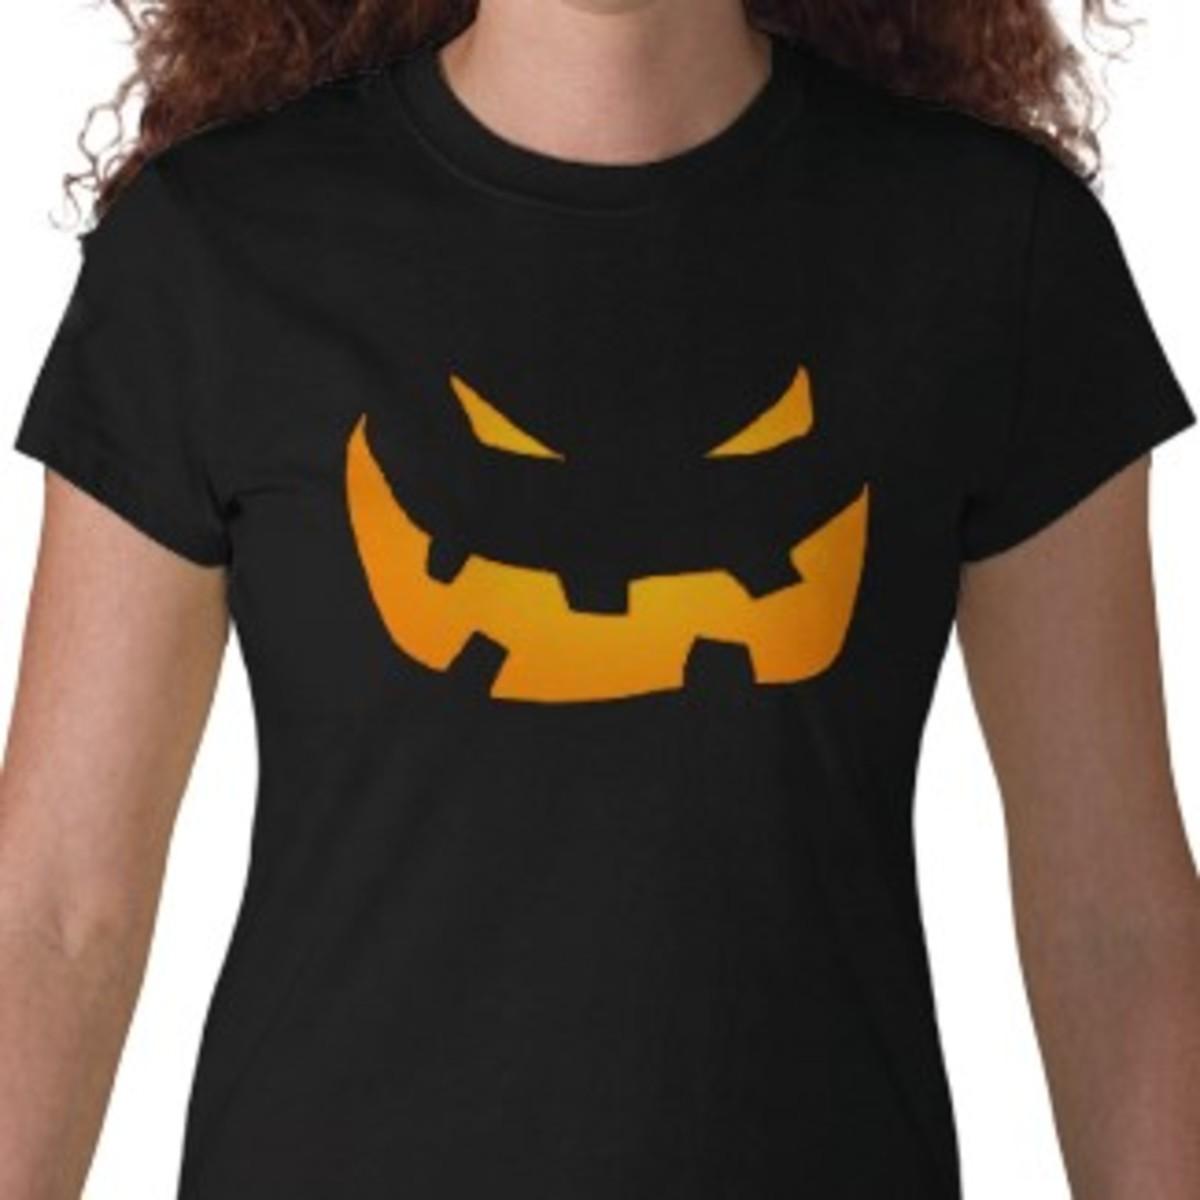 Black pumpkin jack o' lantern shirt created by Nightmareartist on Zazzle